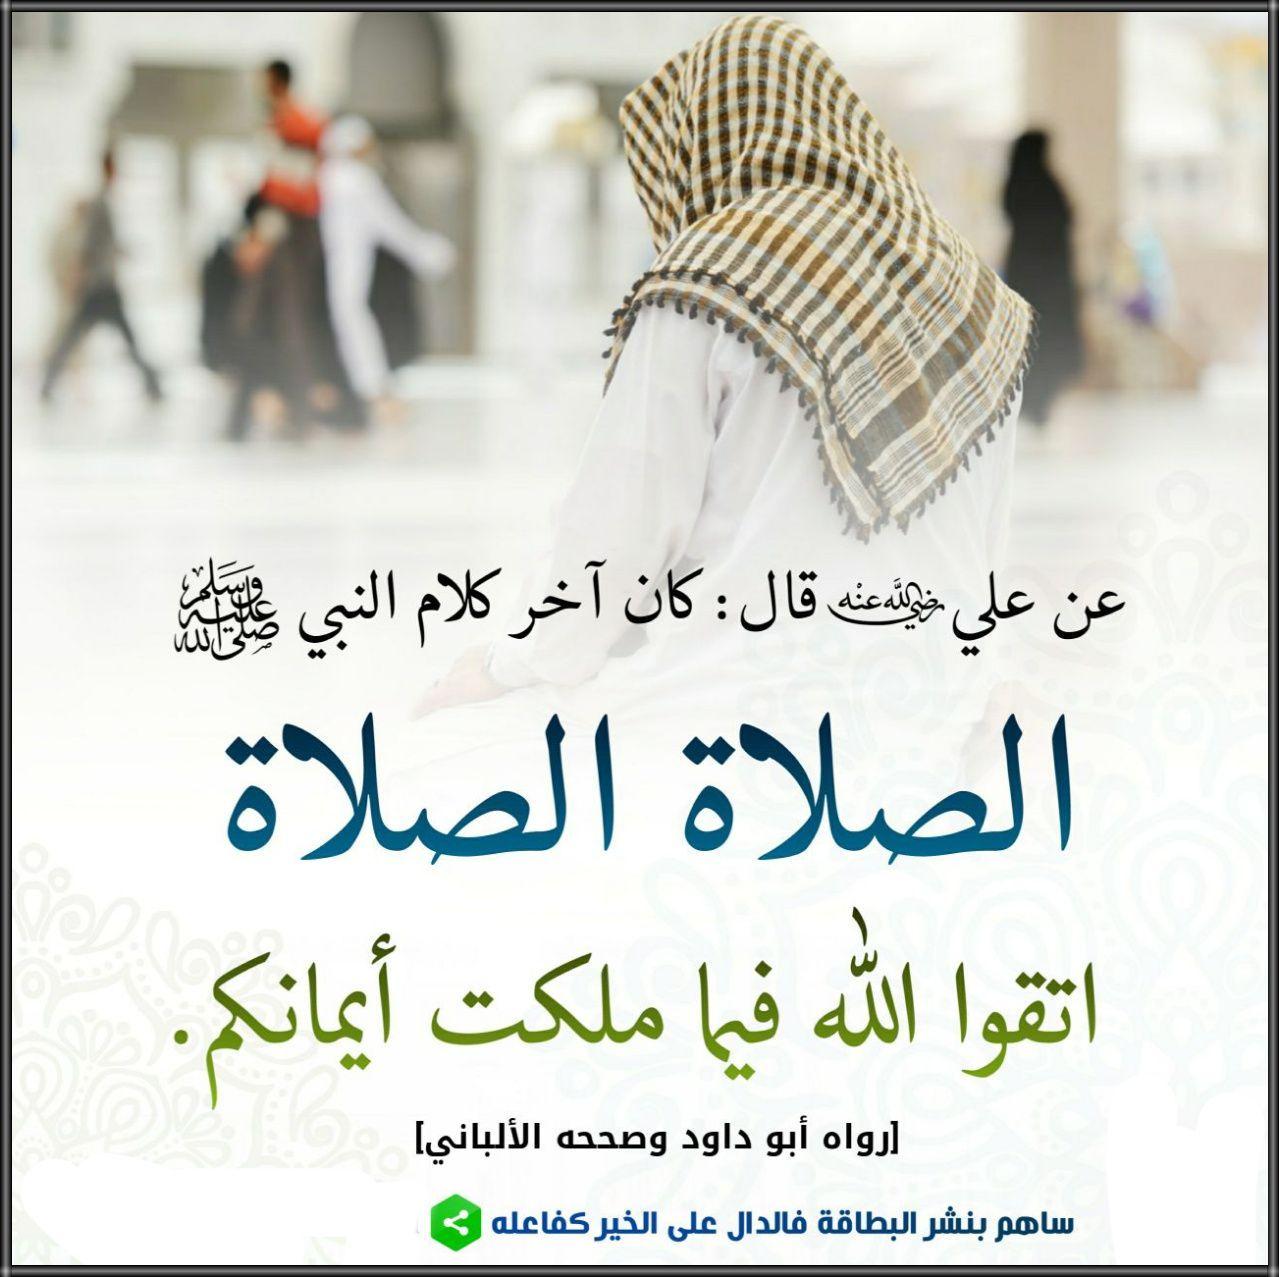 Pin By Ziyani Souad On أقوال الصحابة والعلماء Muslim Quotes Quran Sharif Duaa Islam